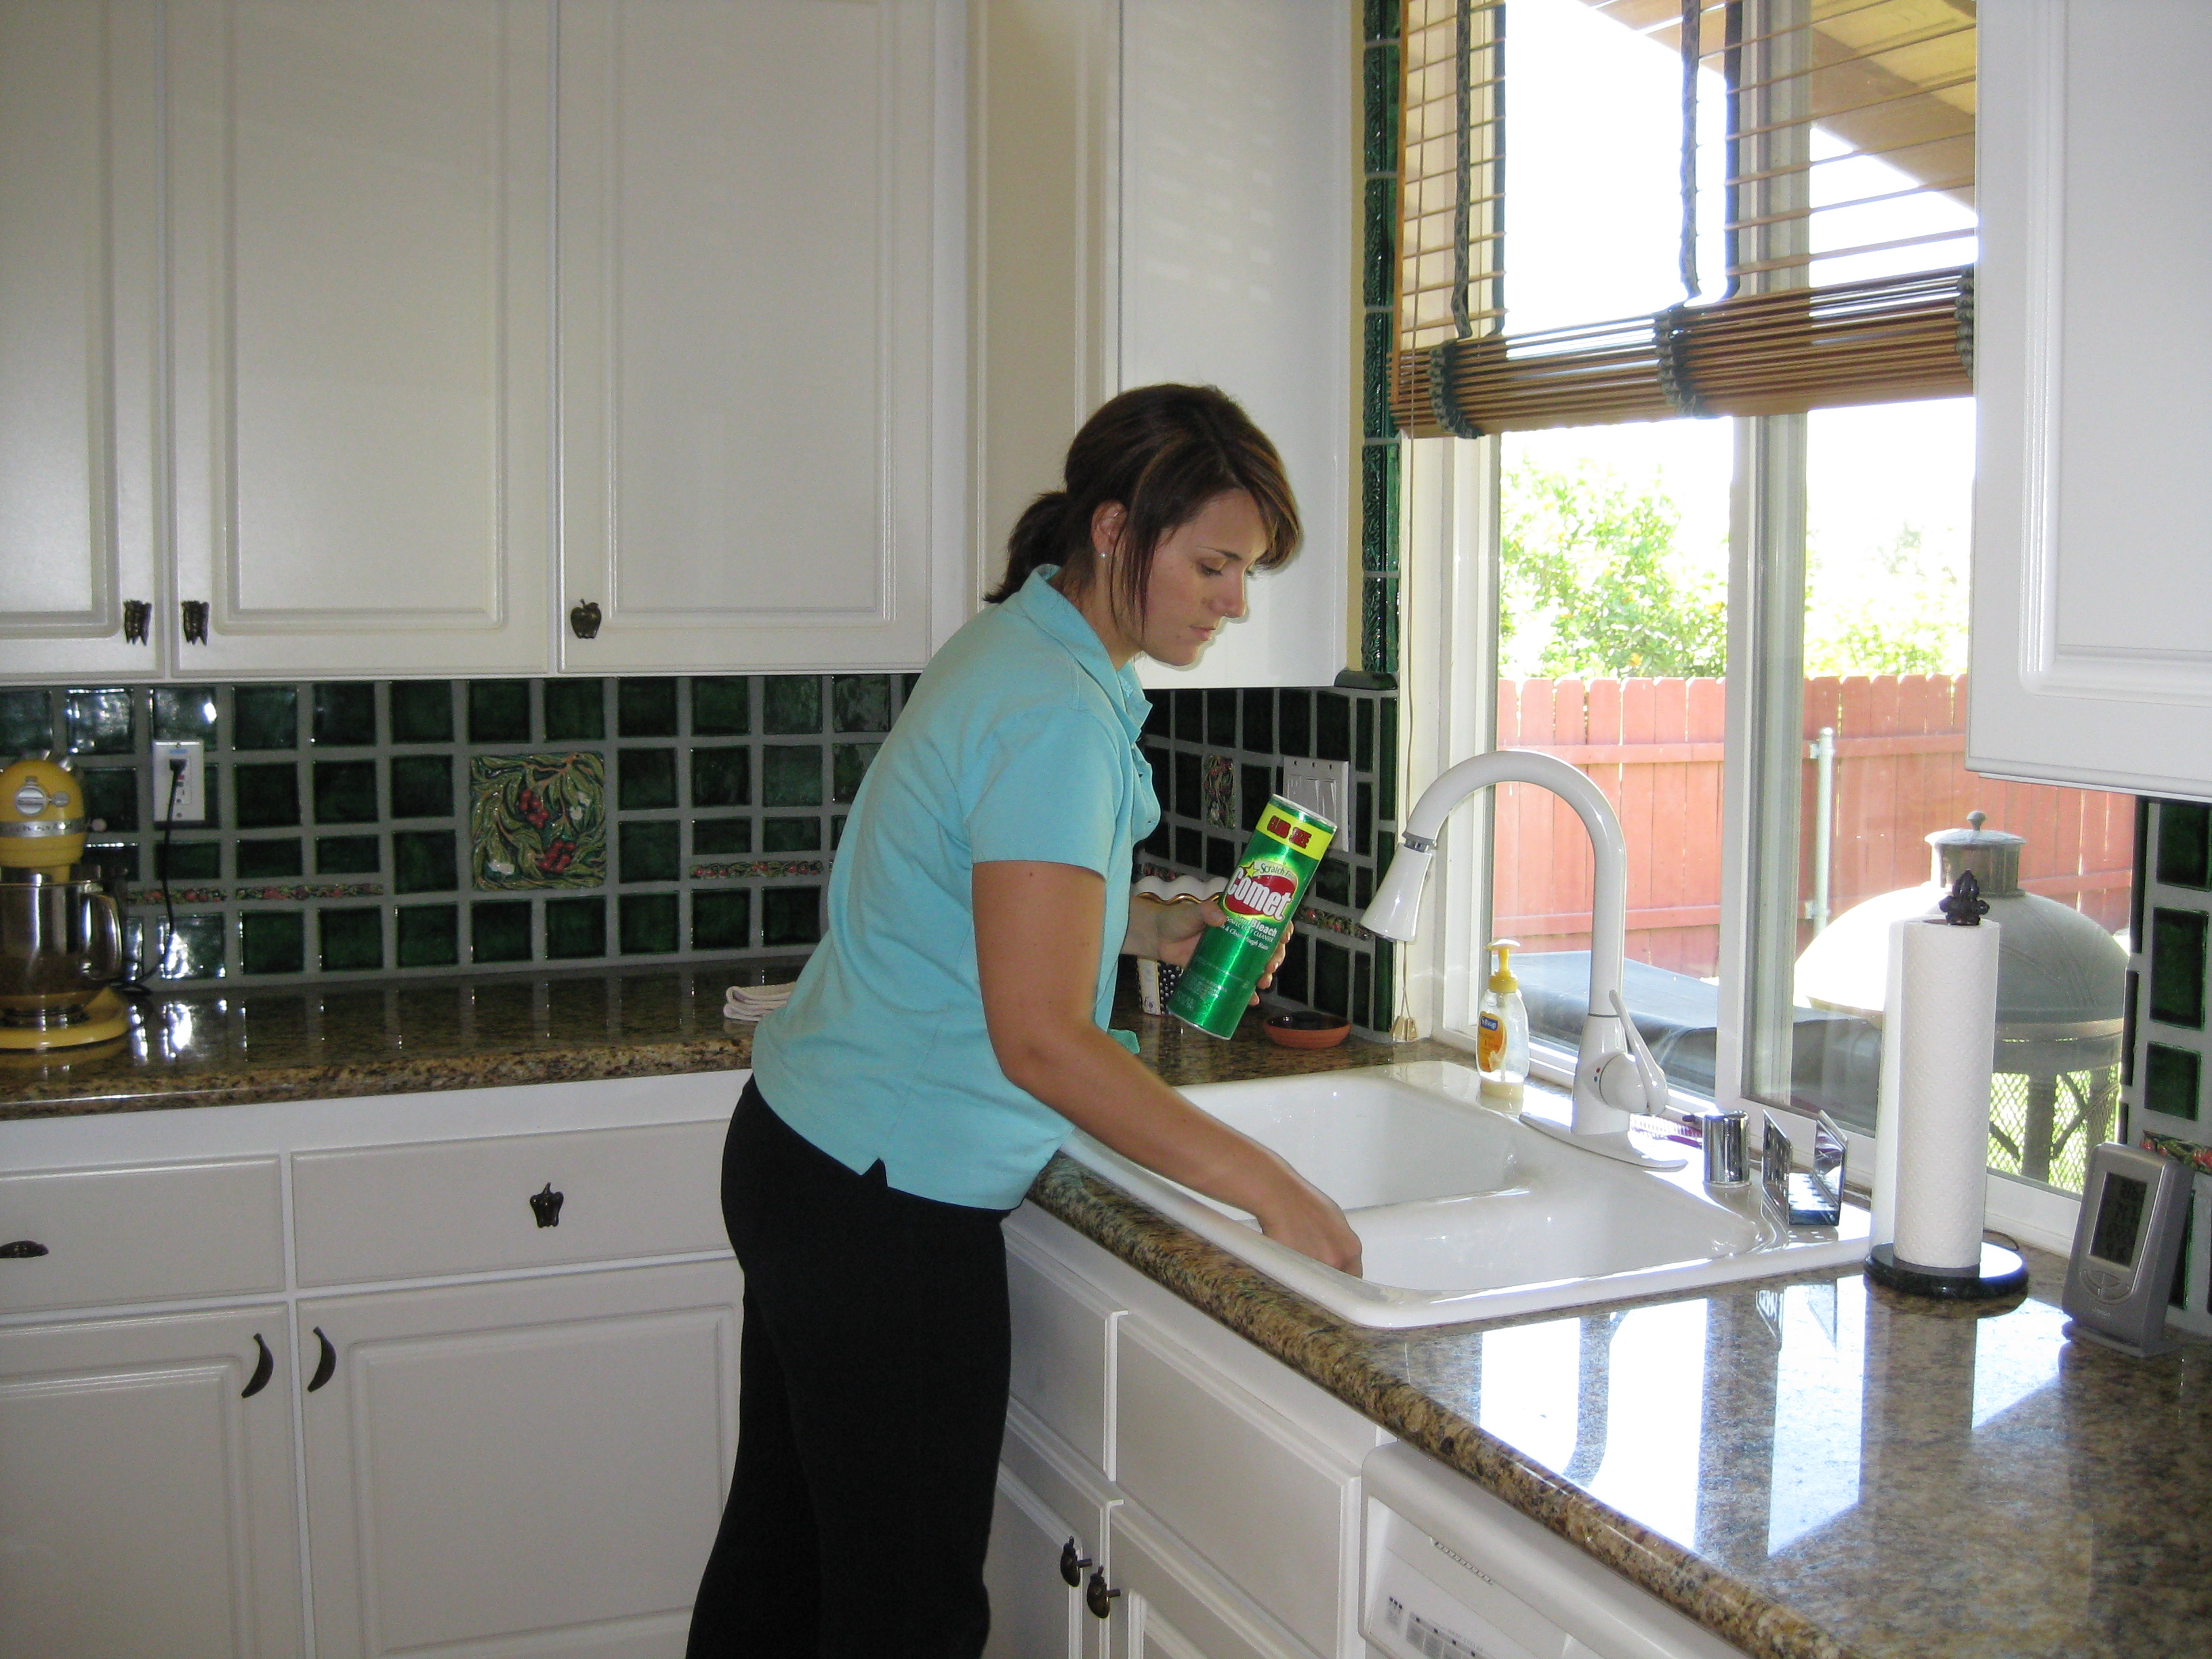 marks handyman service